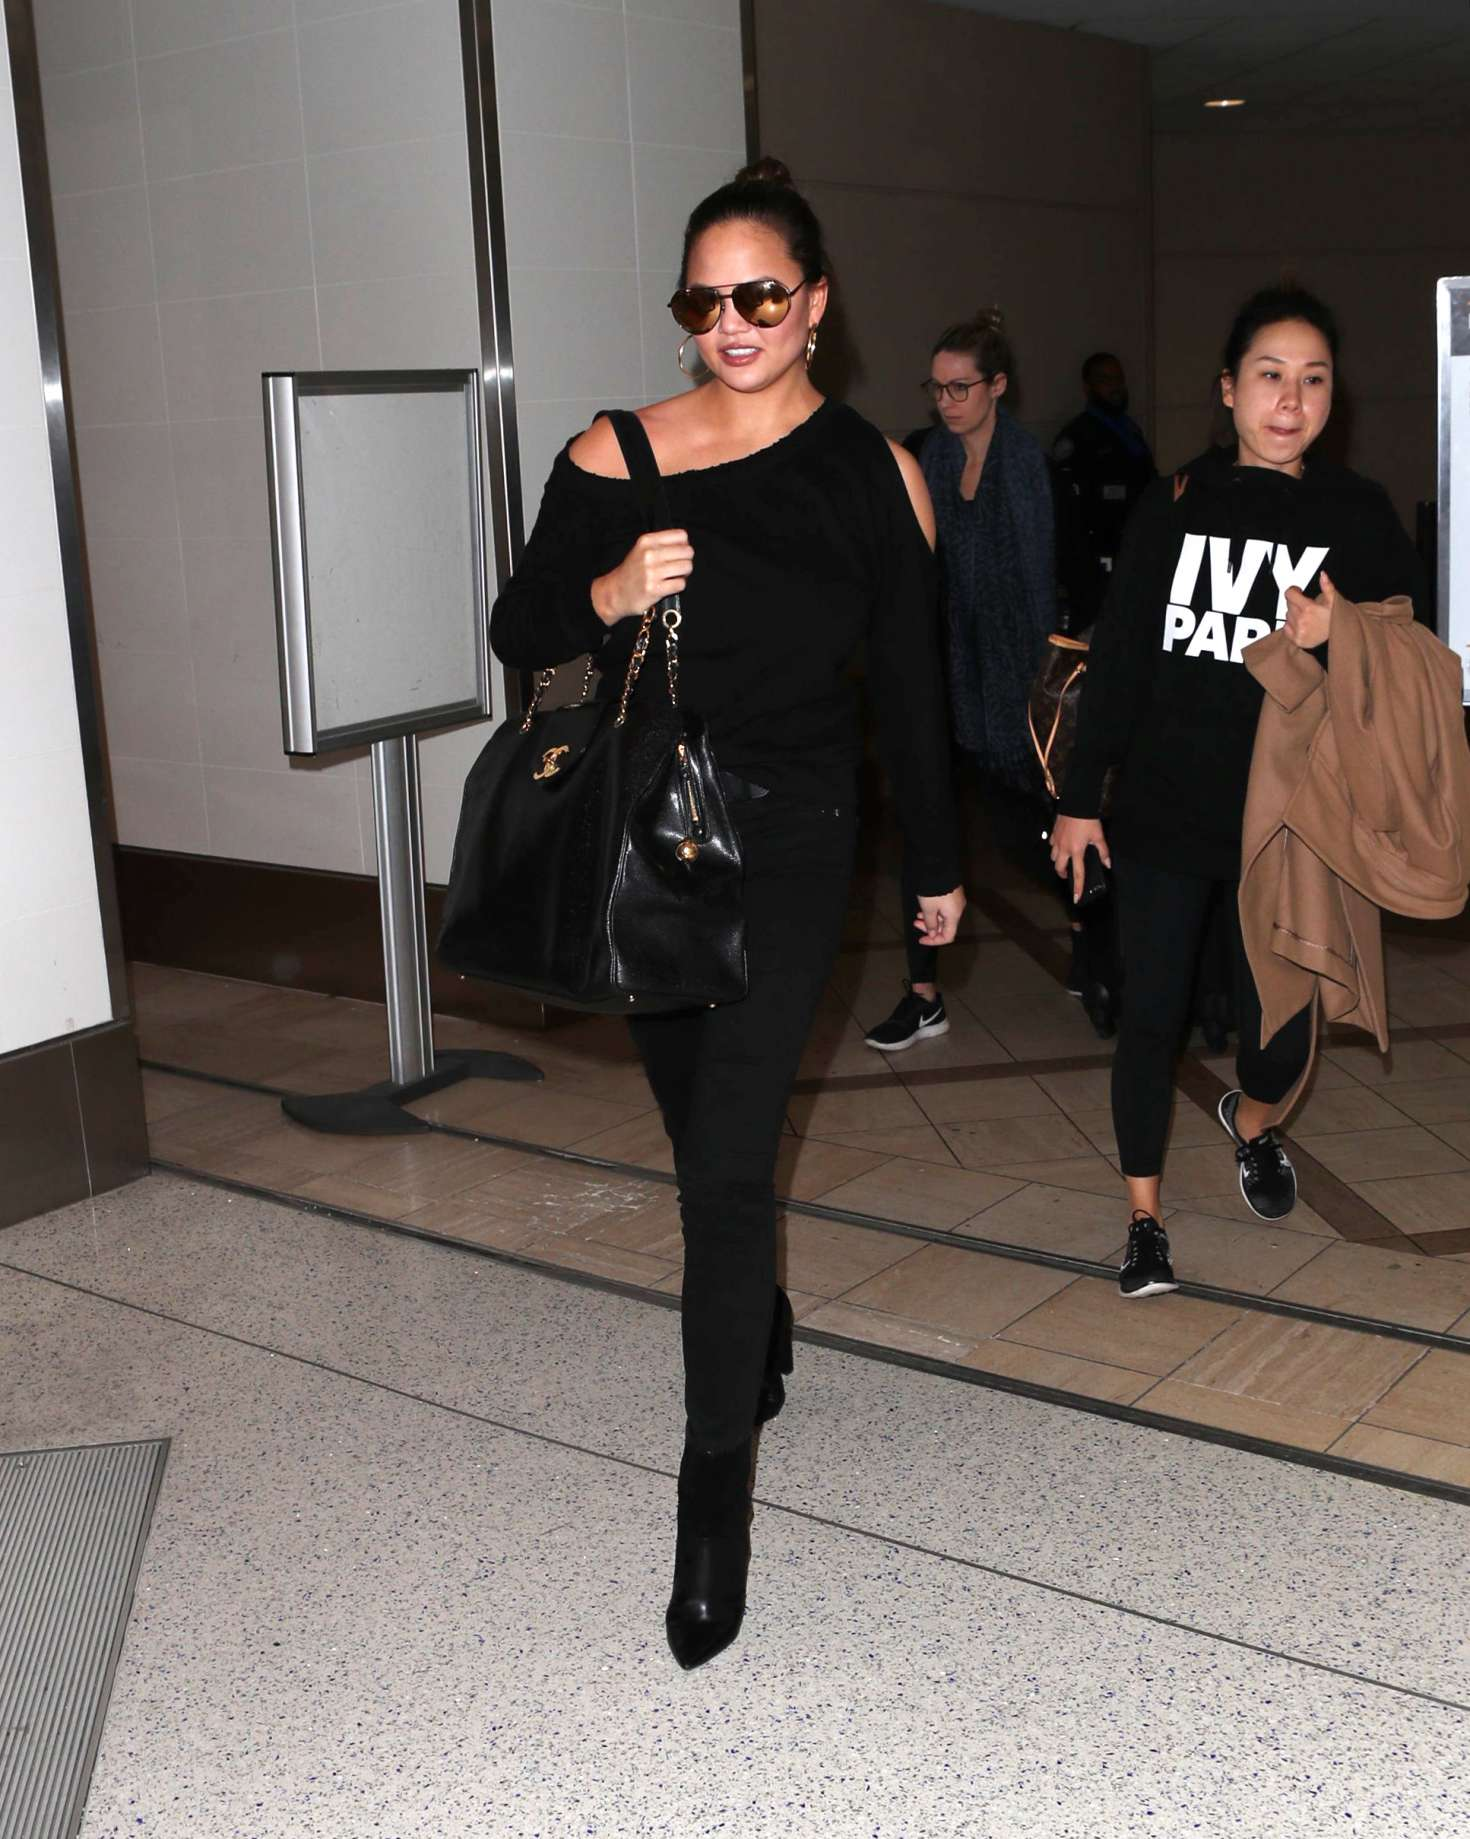 Chrissy Teigen 2015 : Chrissy Teigen: Arrives at LAX Airport -01